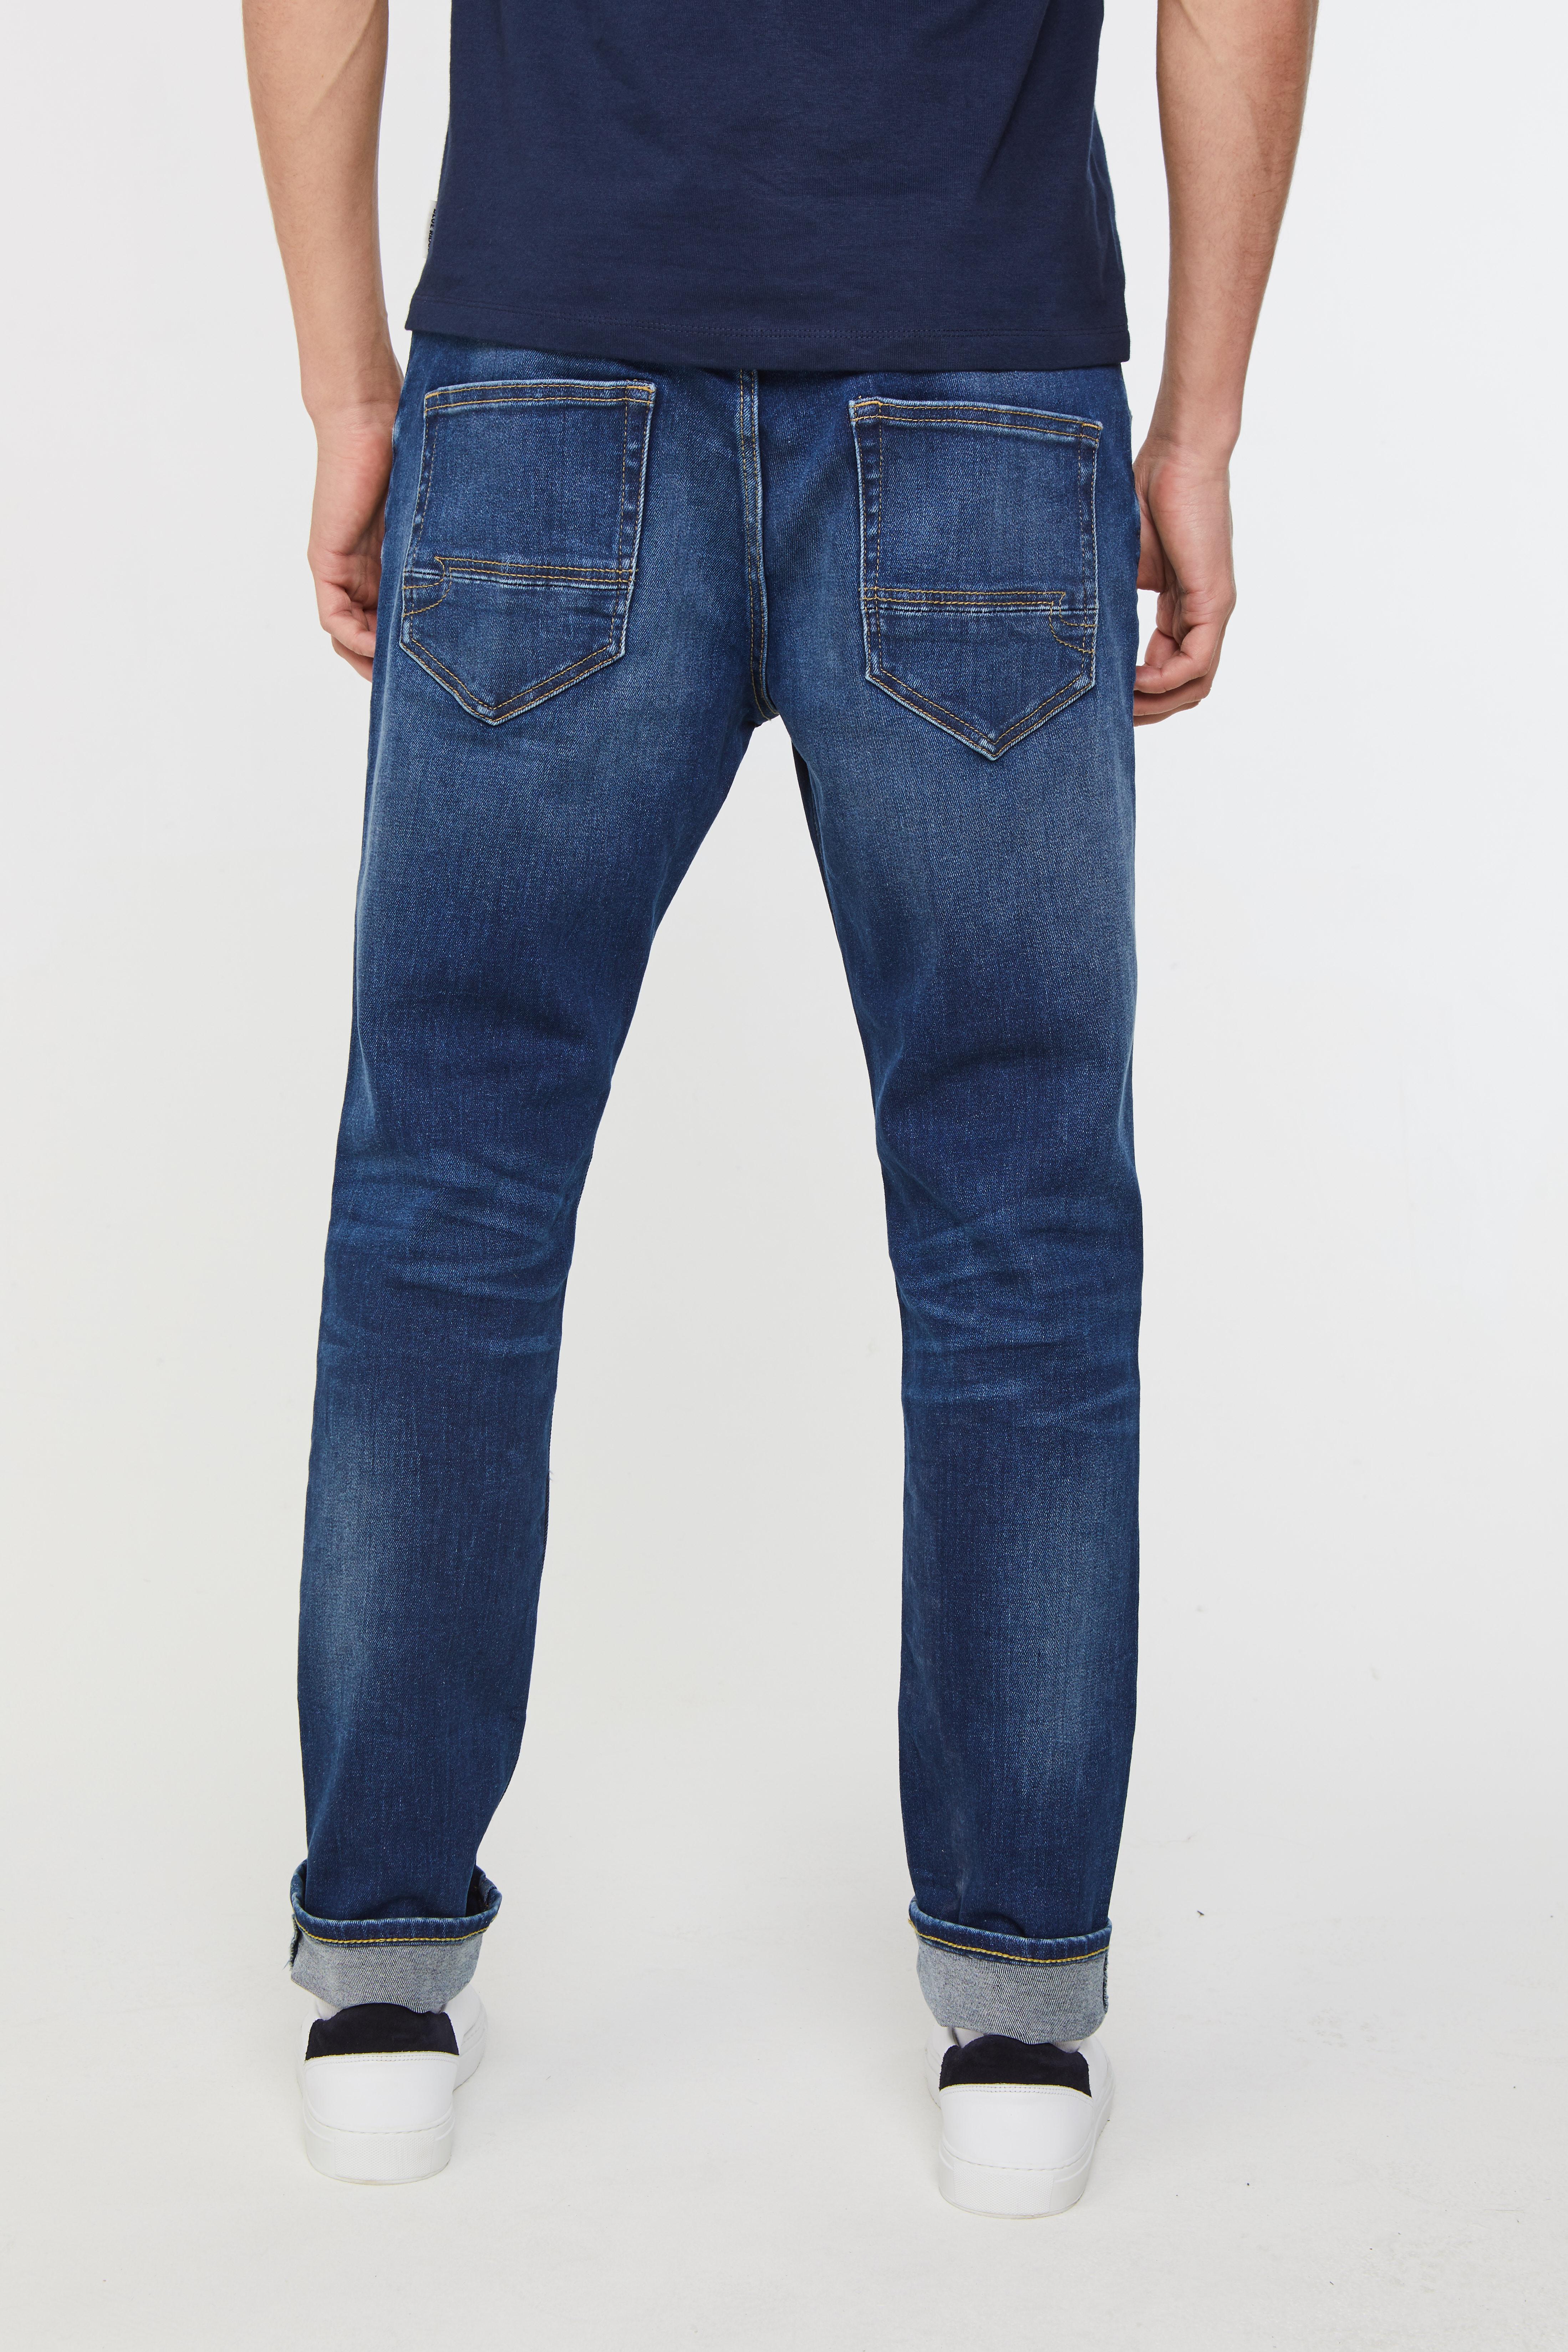 Heren slim tapered jog denim jeans | 94610956 WE Fashion